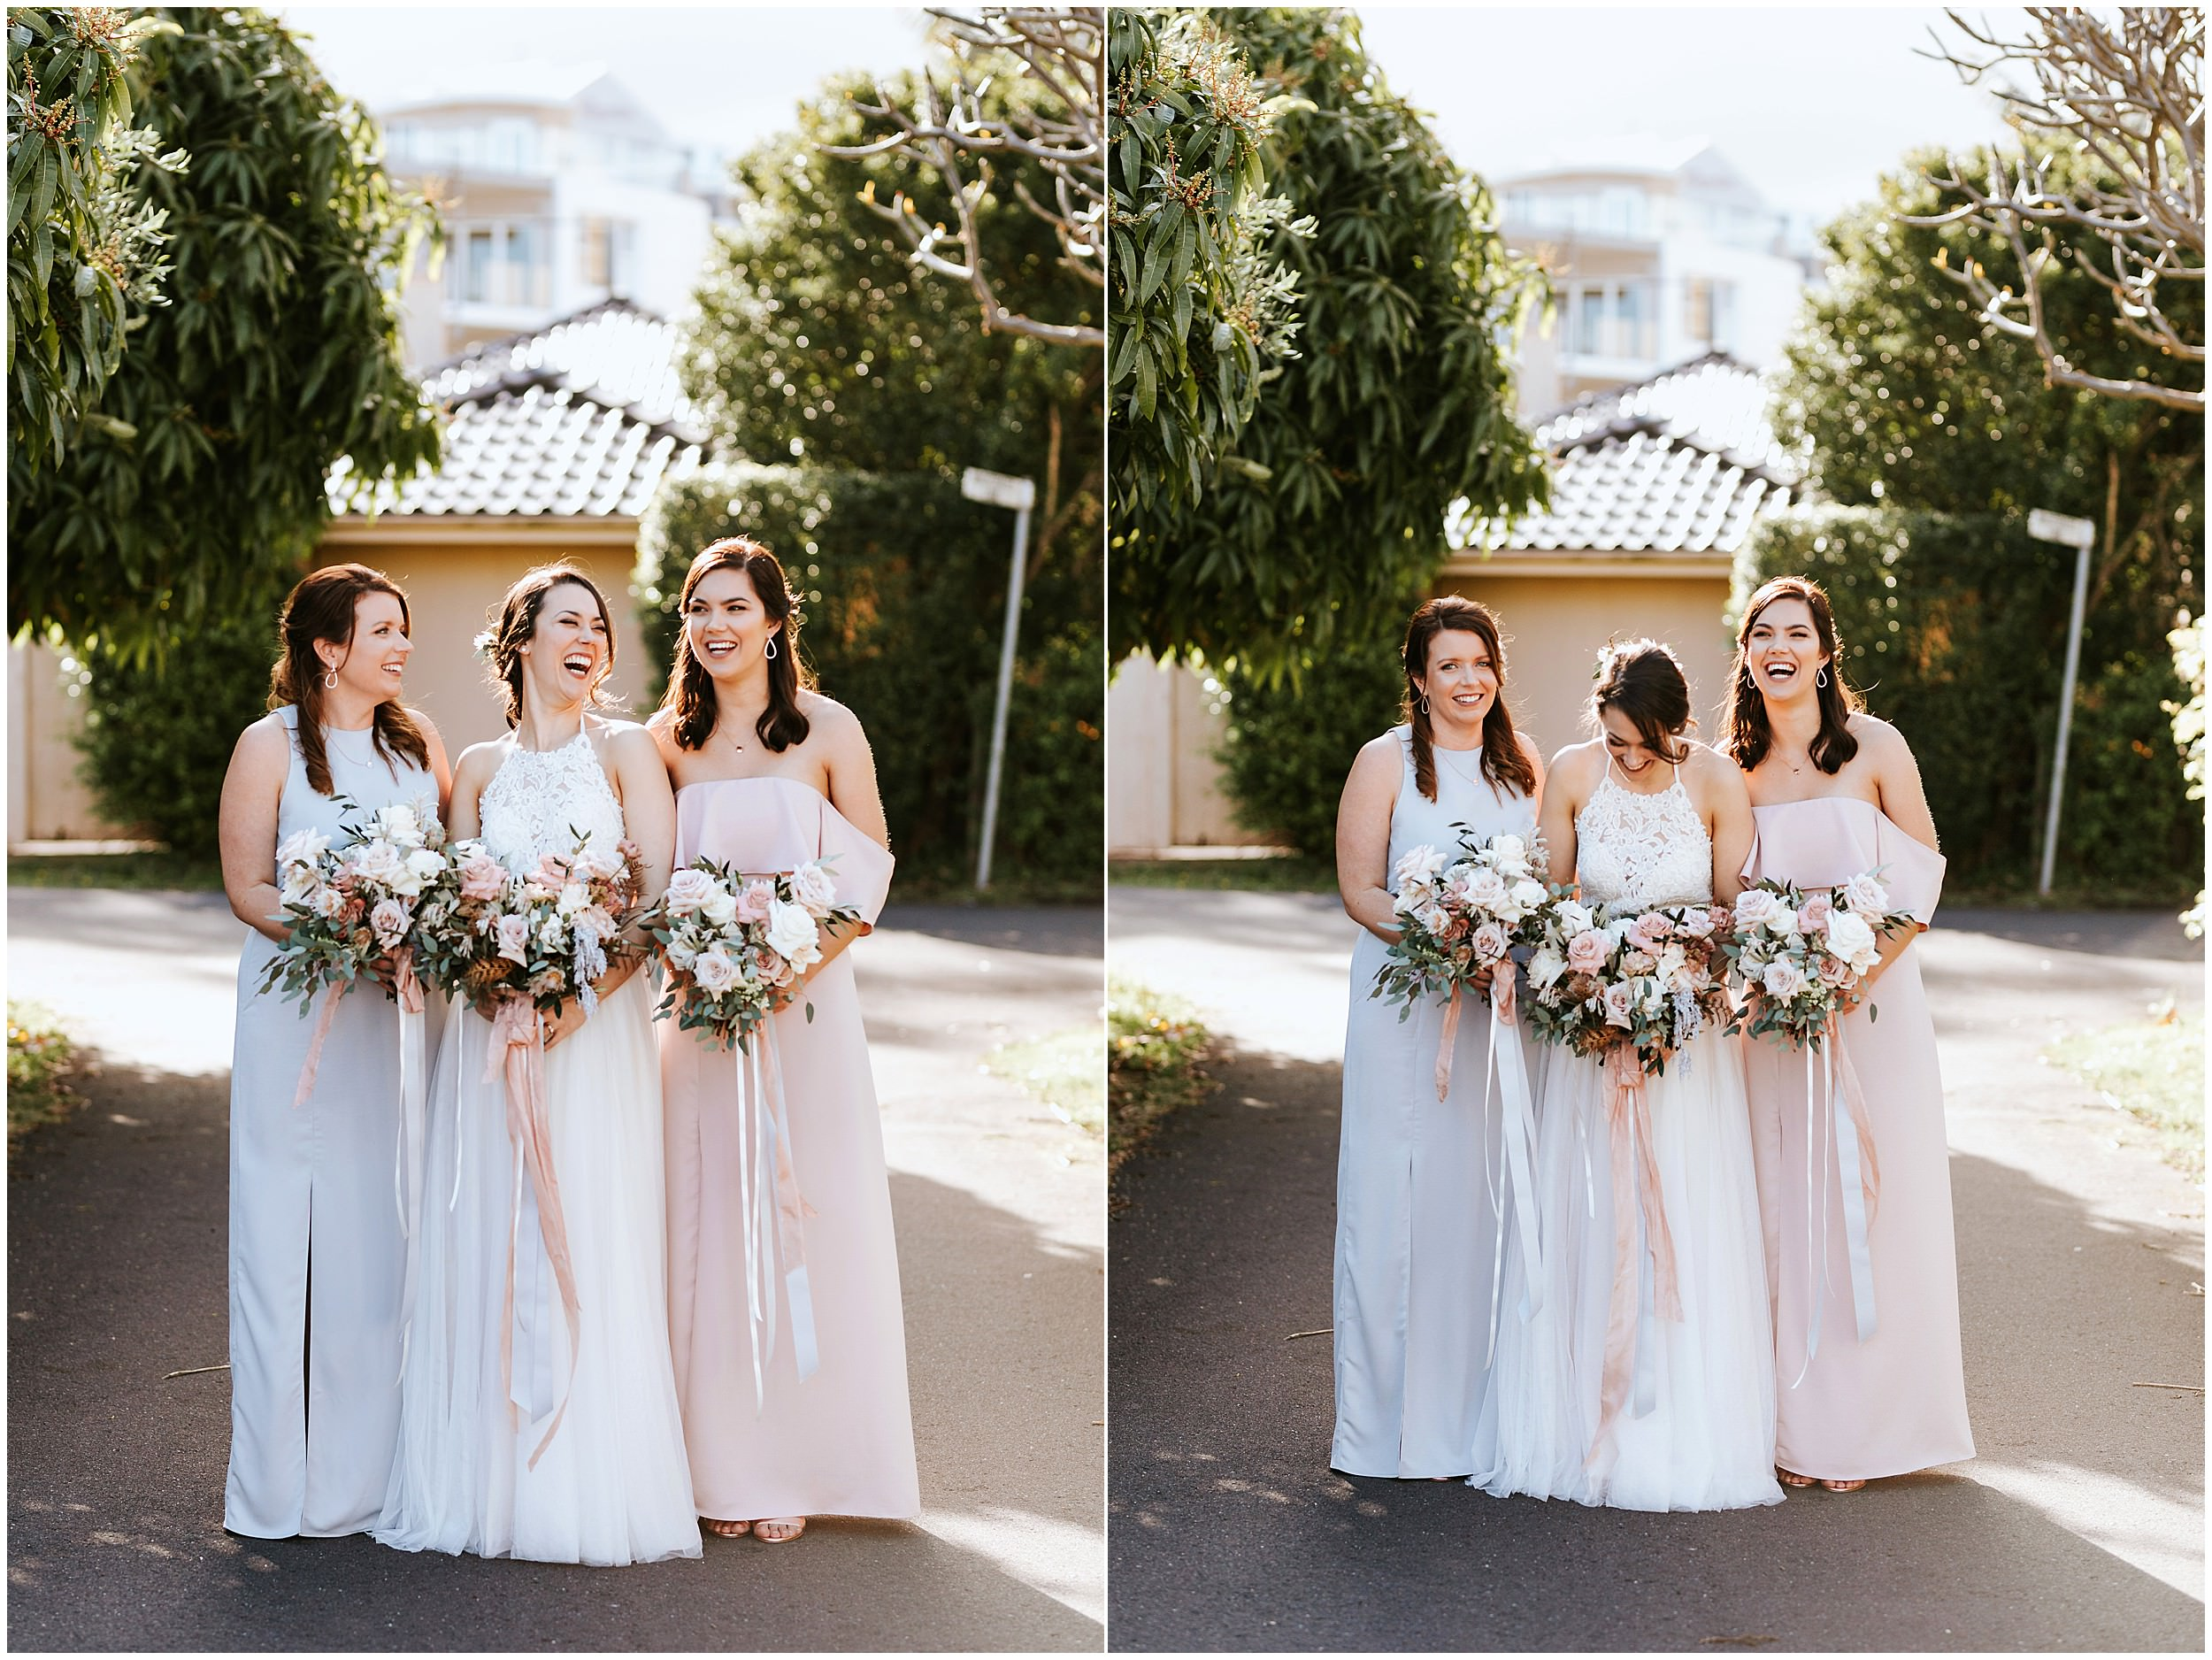 wedding_the_woolshed_steph_zac_0042.jpg